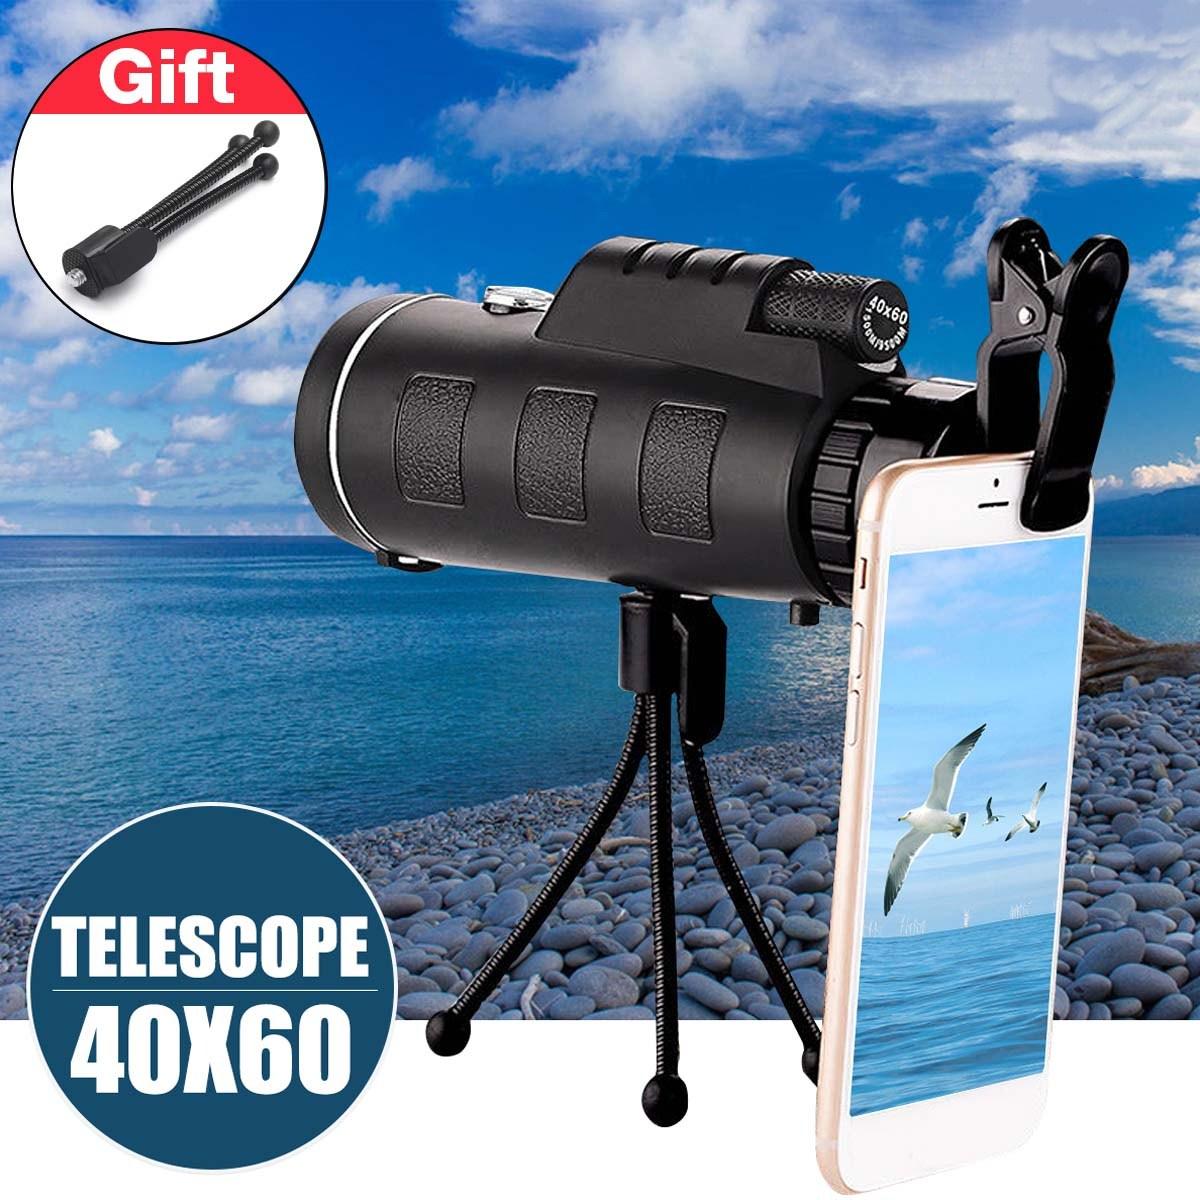 16x52/40x60 HD Waterproof Universal Phone Telescope,Focus Zoom Optical Lens Monocular Telescope+ Tripod + Mini Clip for Outdoor Camping Hunting Traveling